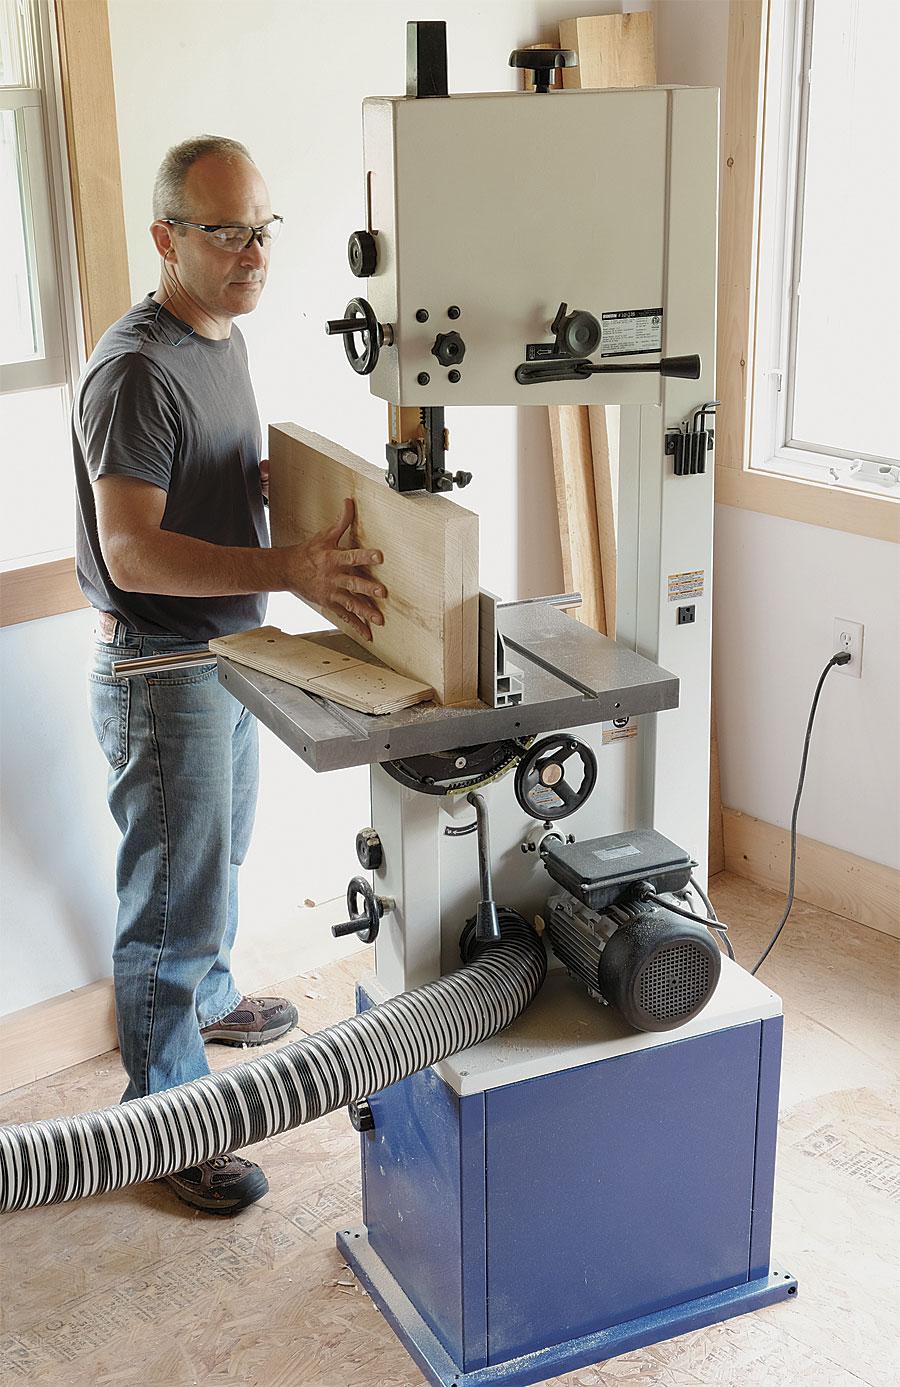 rikon 10-326 14-in bandsaw - finewoodworking